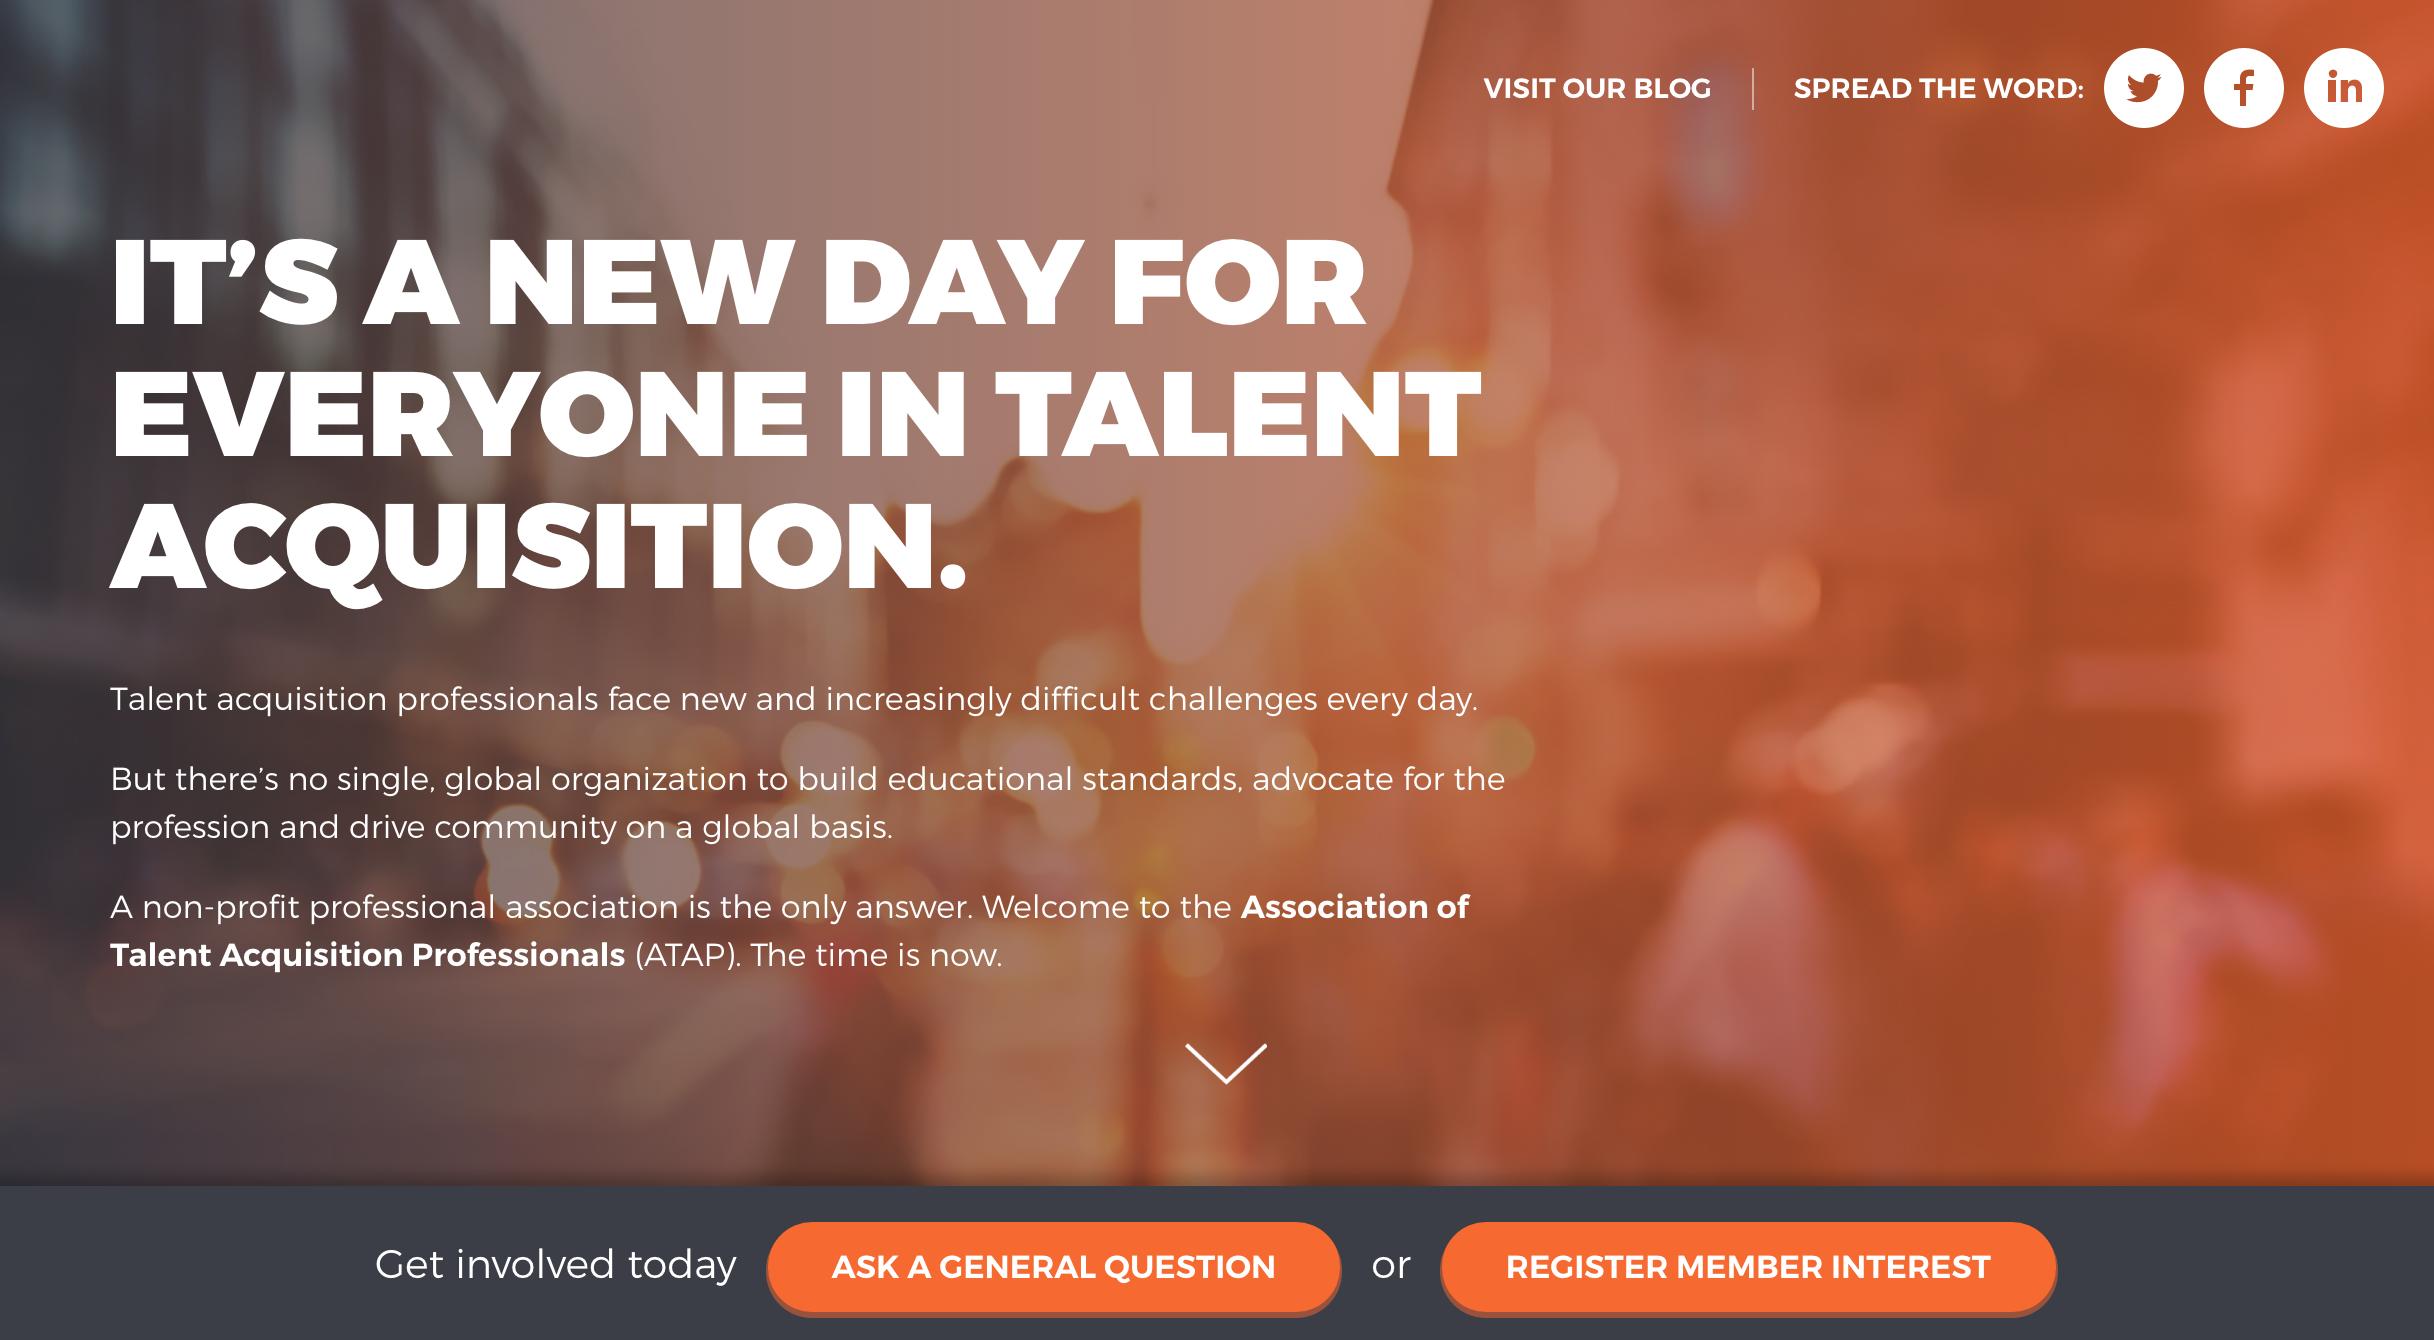 Association of Talent Acquisition Professionals